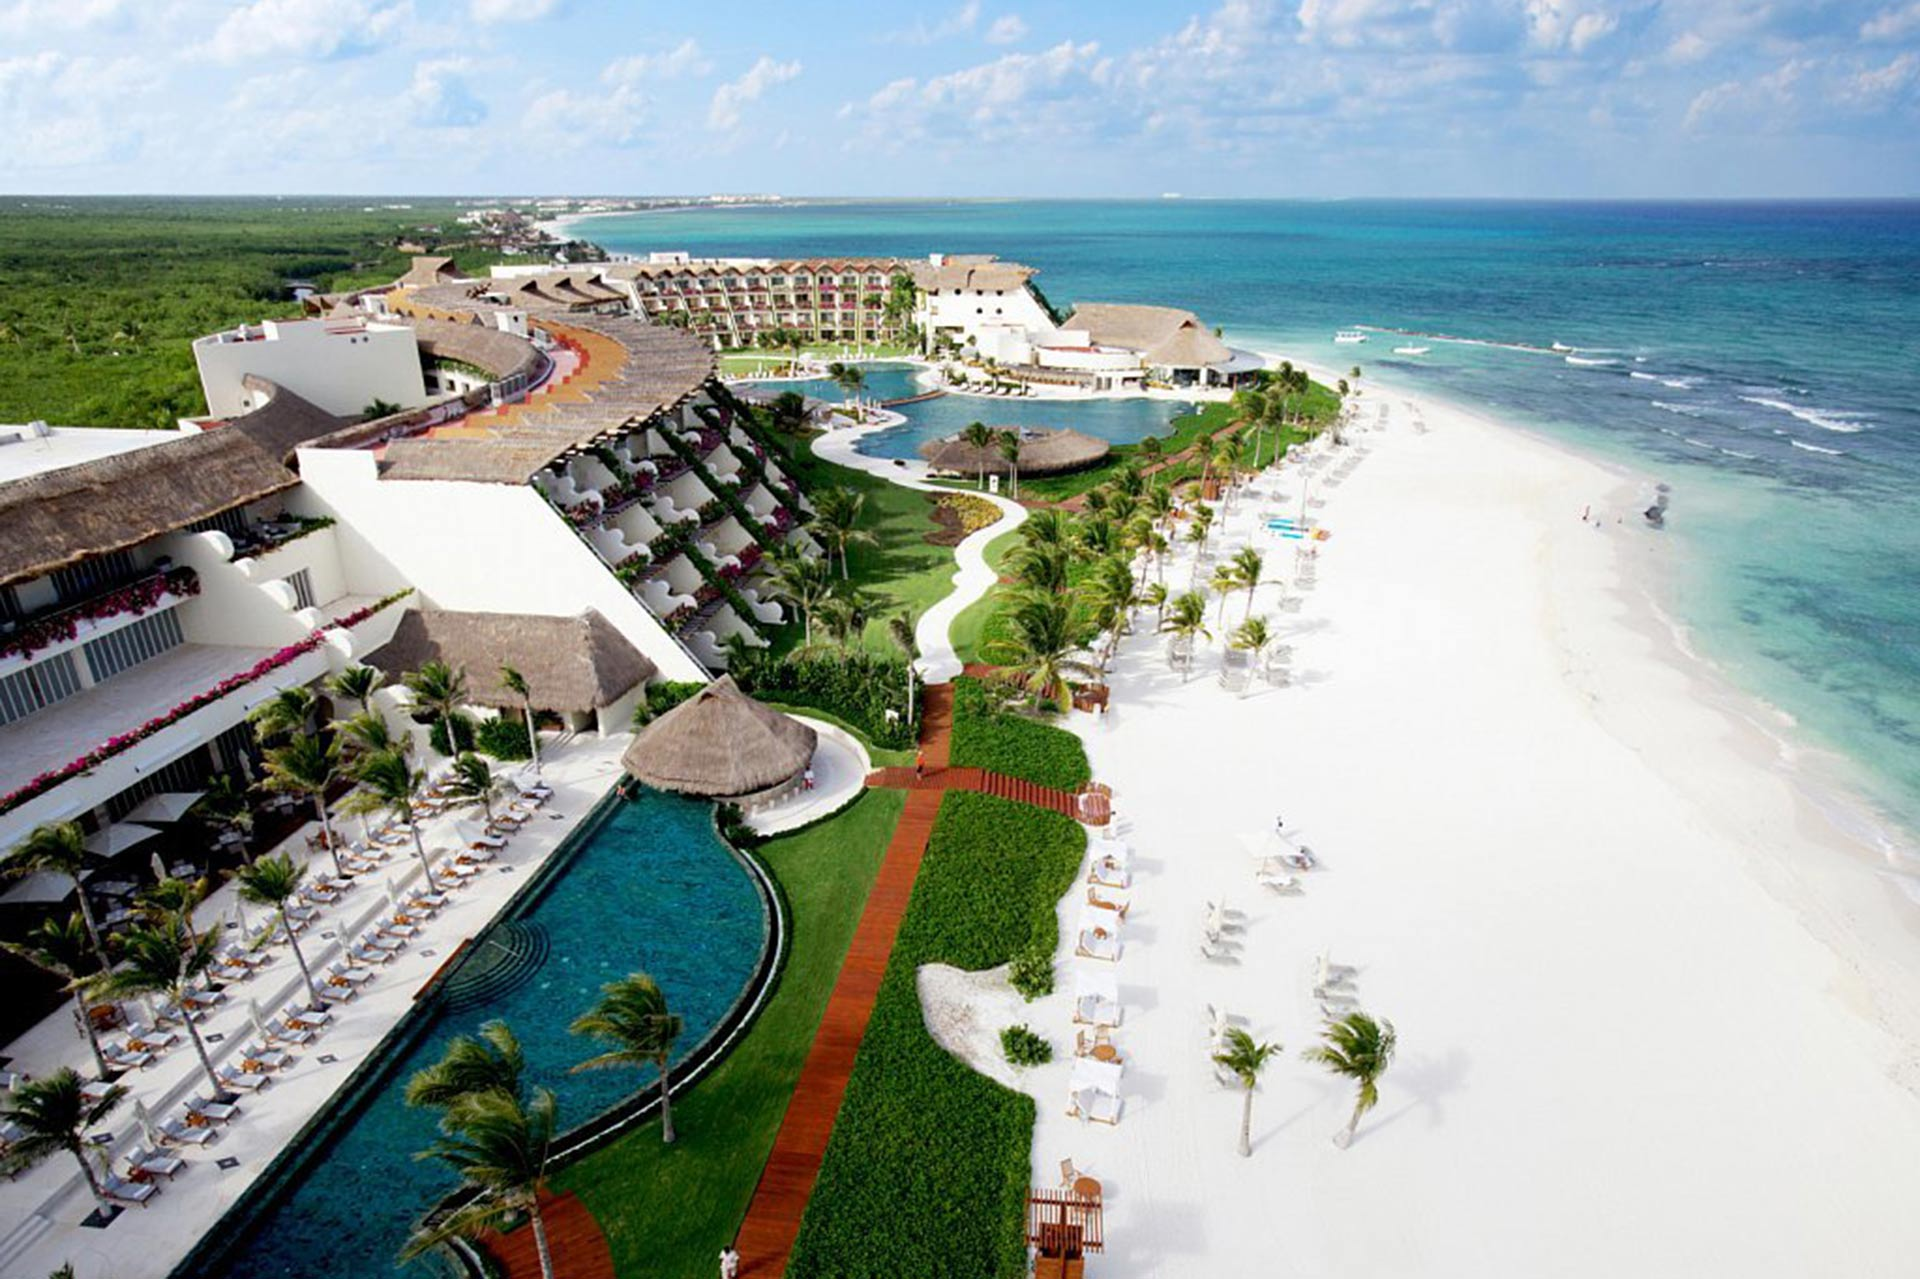 Beach at Grand Velas Riviera Maya - Riviera Maya, MX - All Inclusive Resort